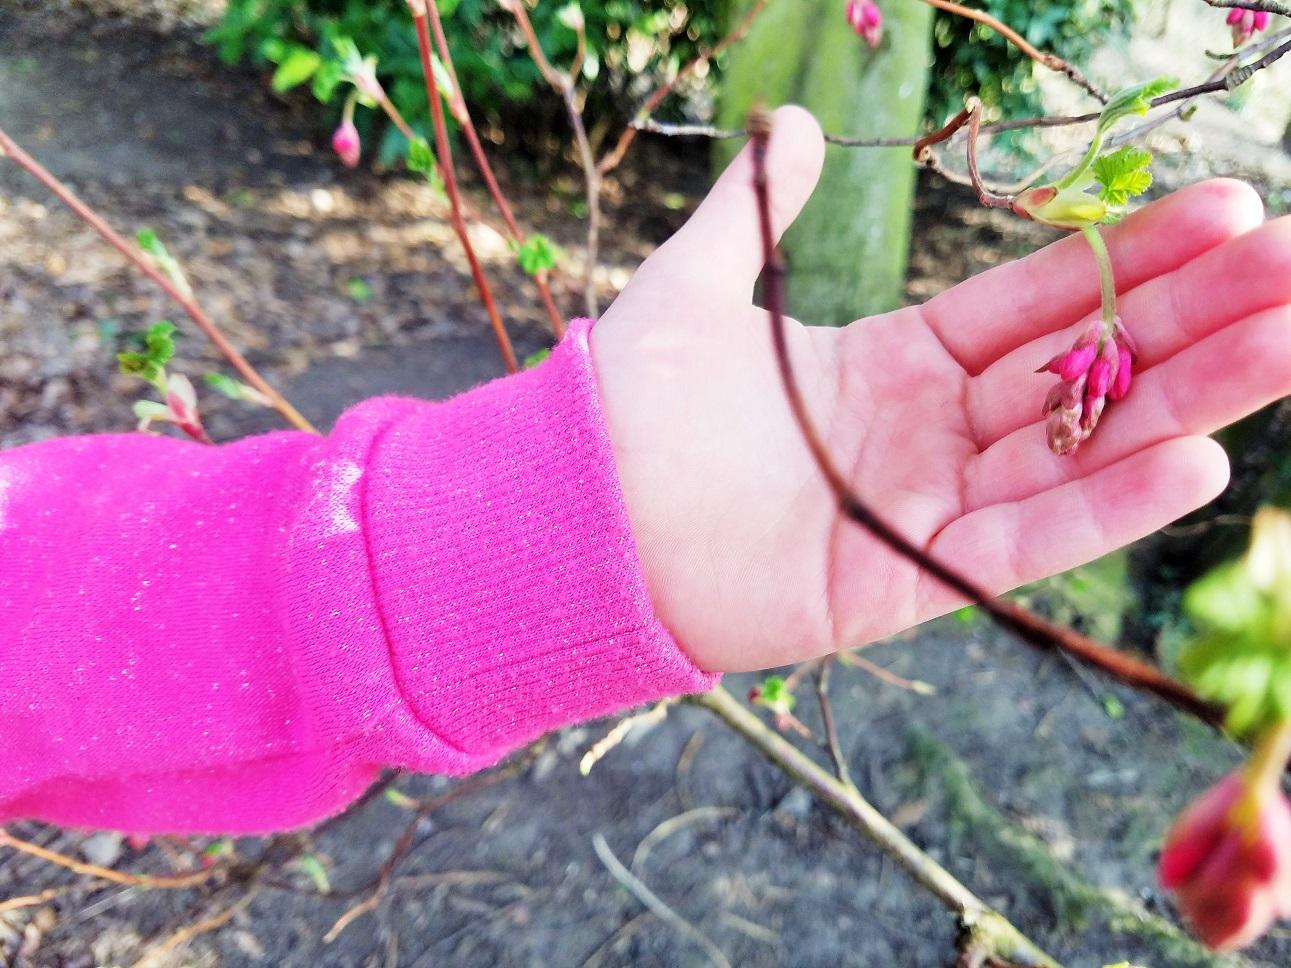 parenting myths about discipline child holding a pink flower bud